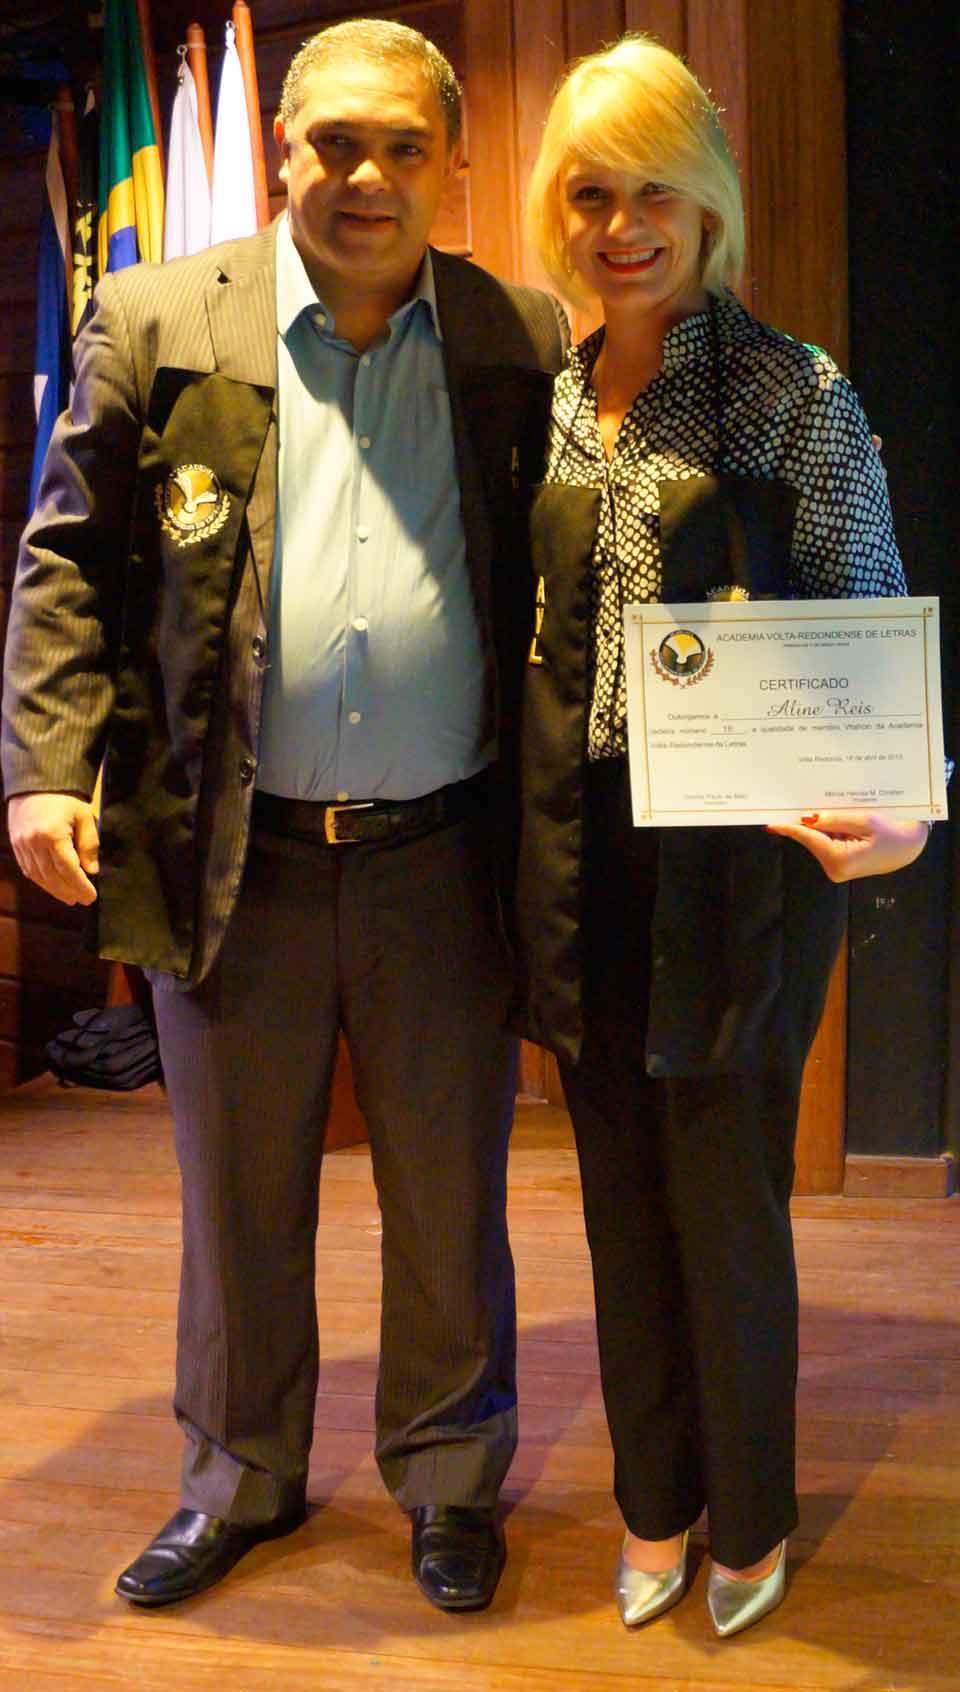 Cerimônia de posse no GACEMSS II - Posse de Aline Reis